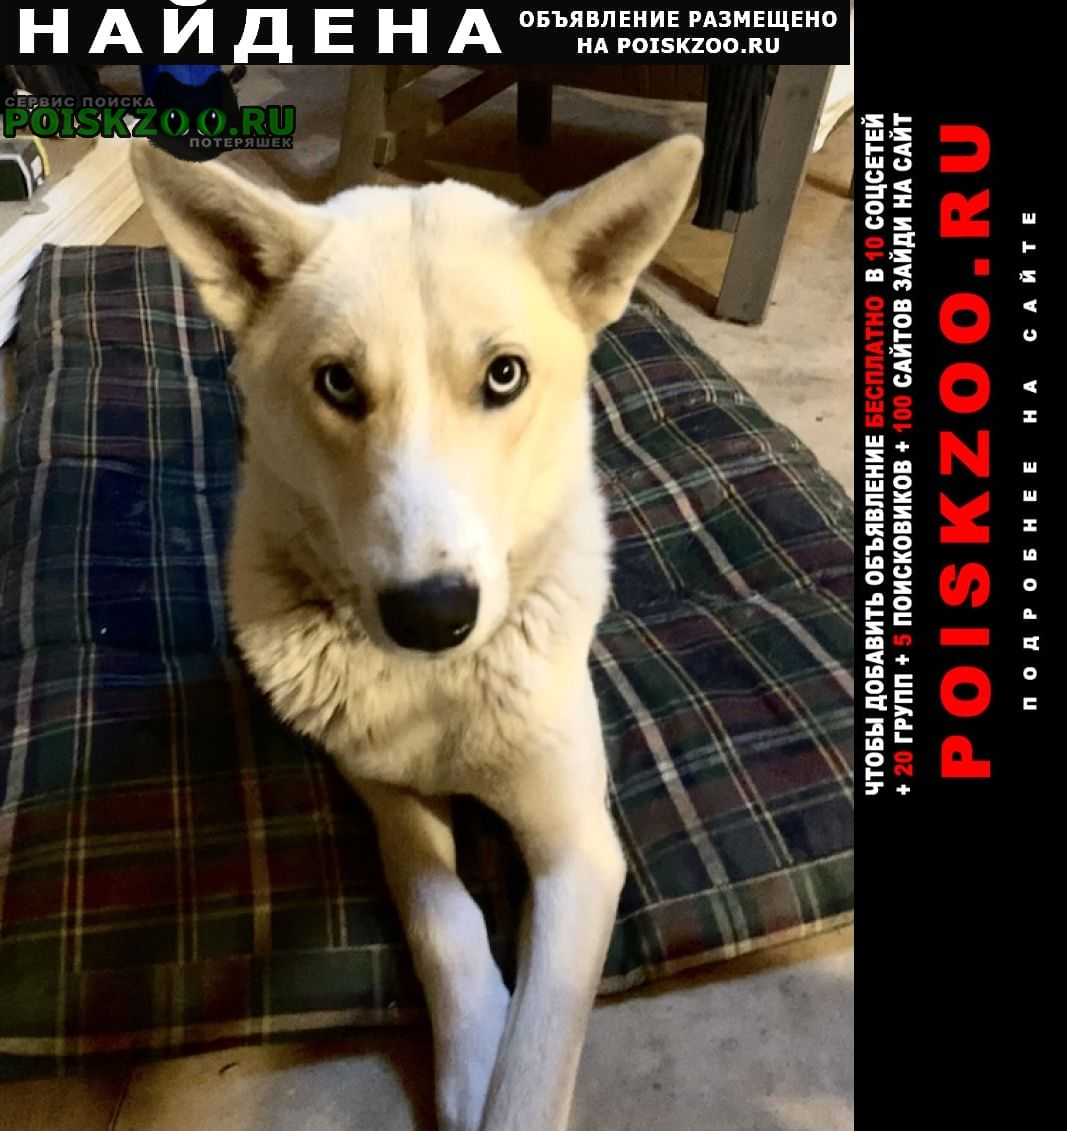 Найдена собака молодая сука, метис лайки Заокский